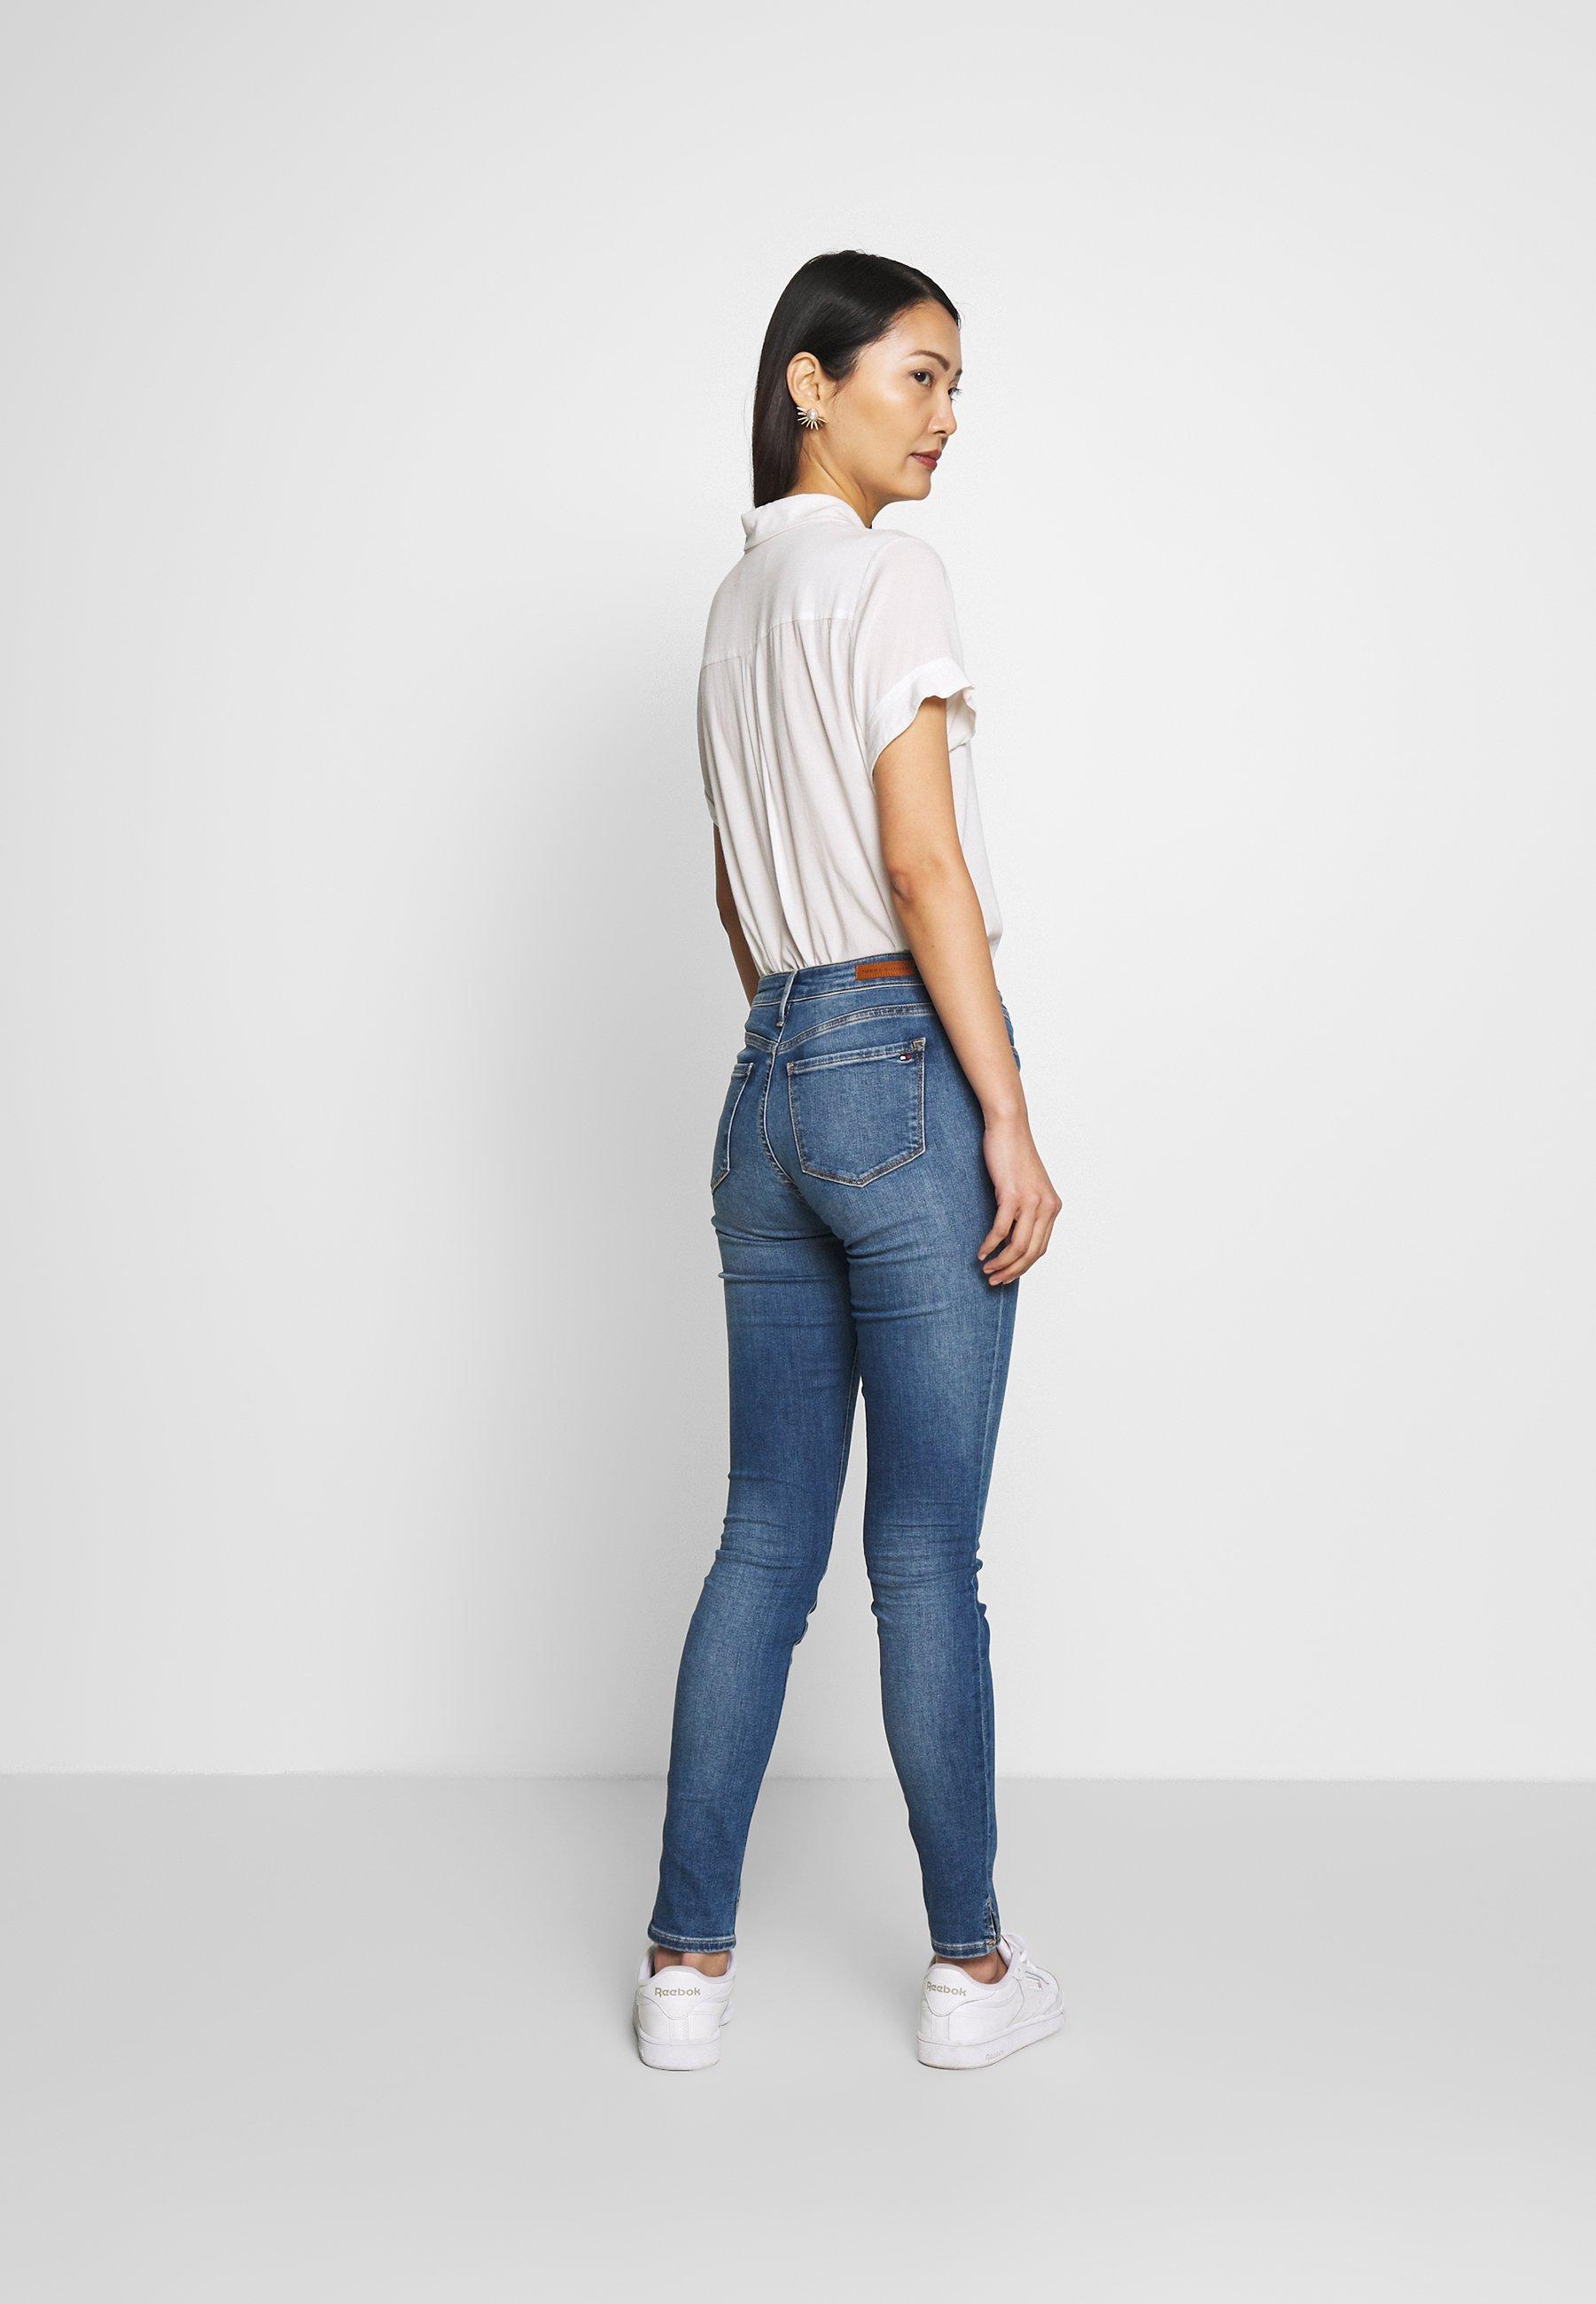 Tommy Hilfiger Como - Jeans Skinny Fit Izzy